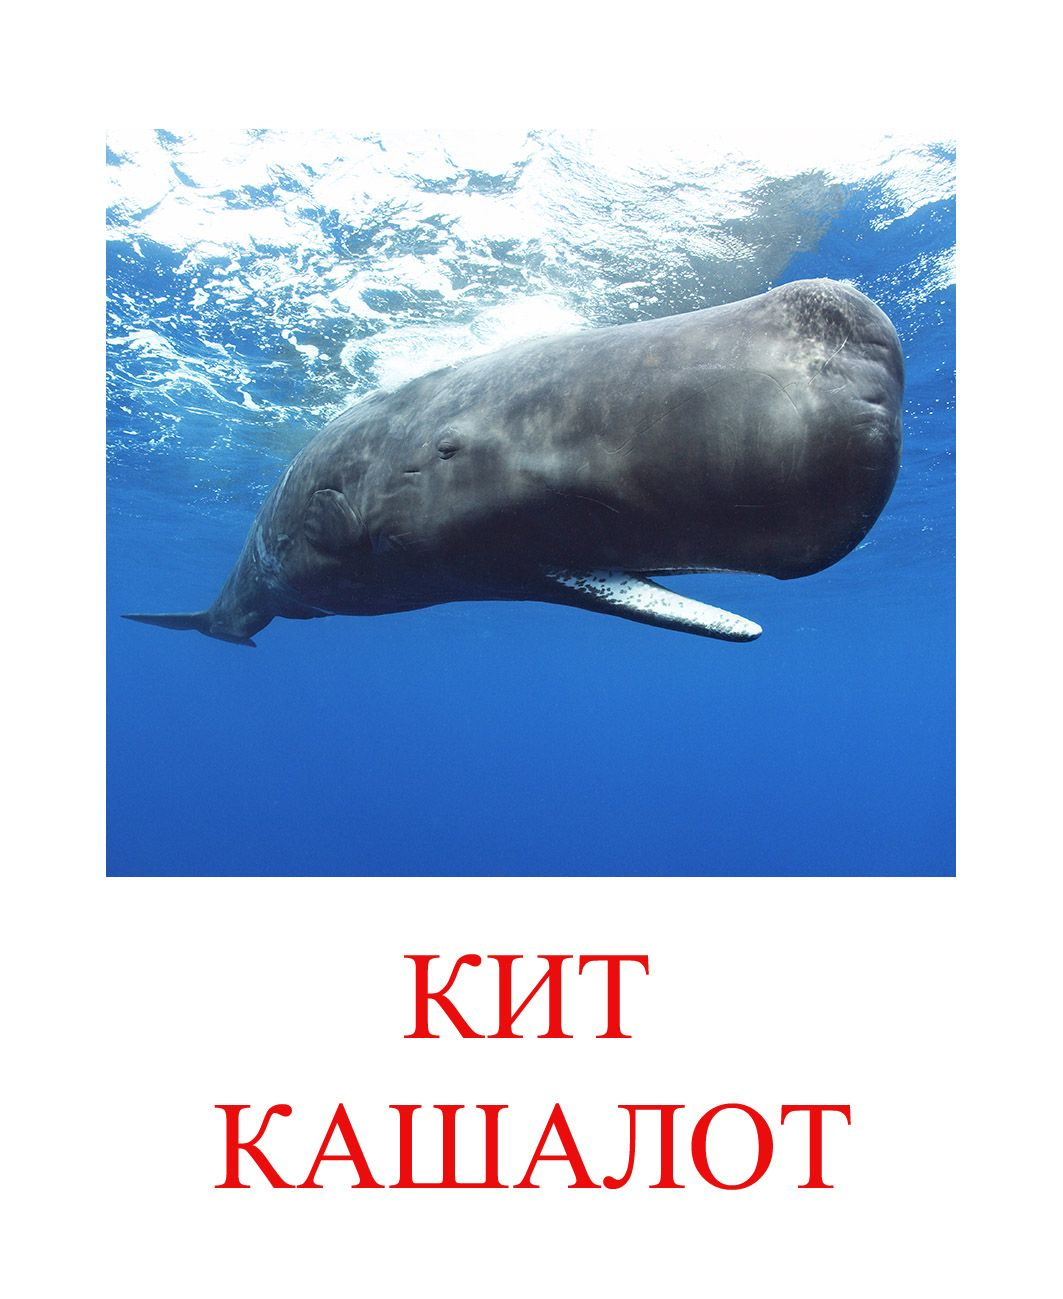 Картинки морских обитателей с названиями для детей